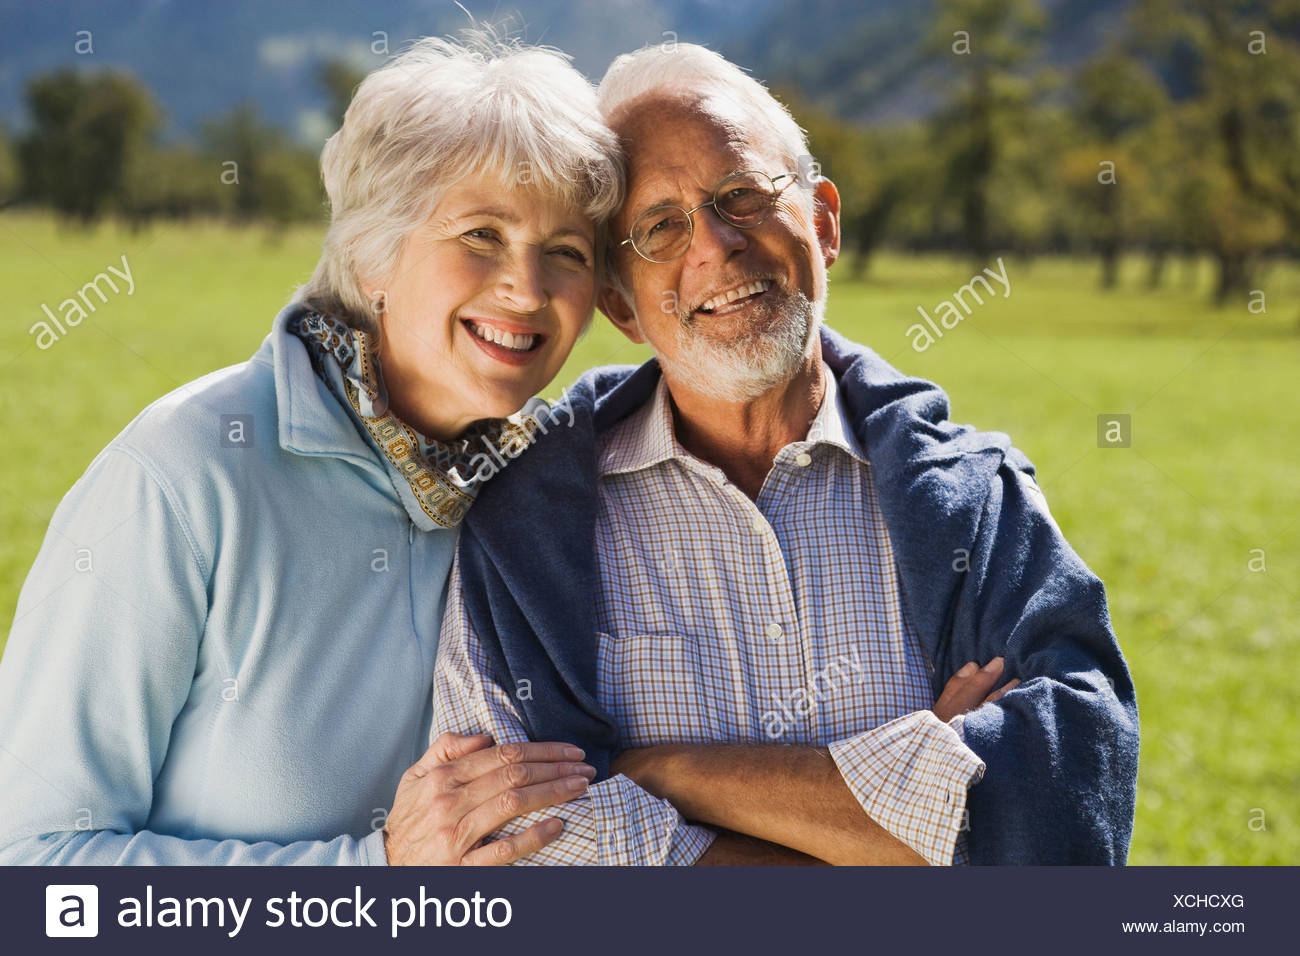 Austria, Karwendel, Ahornboden, Senior couple, smiling, portrait - Stock Image